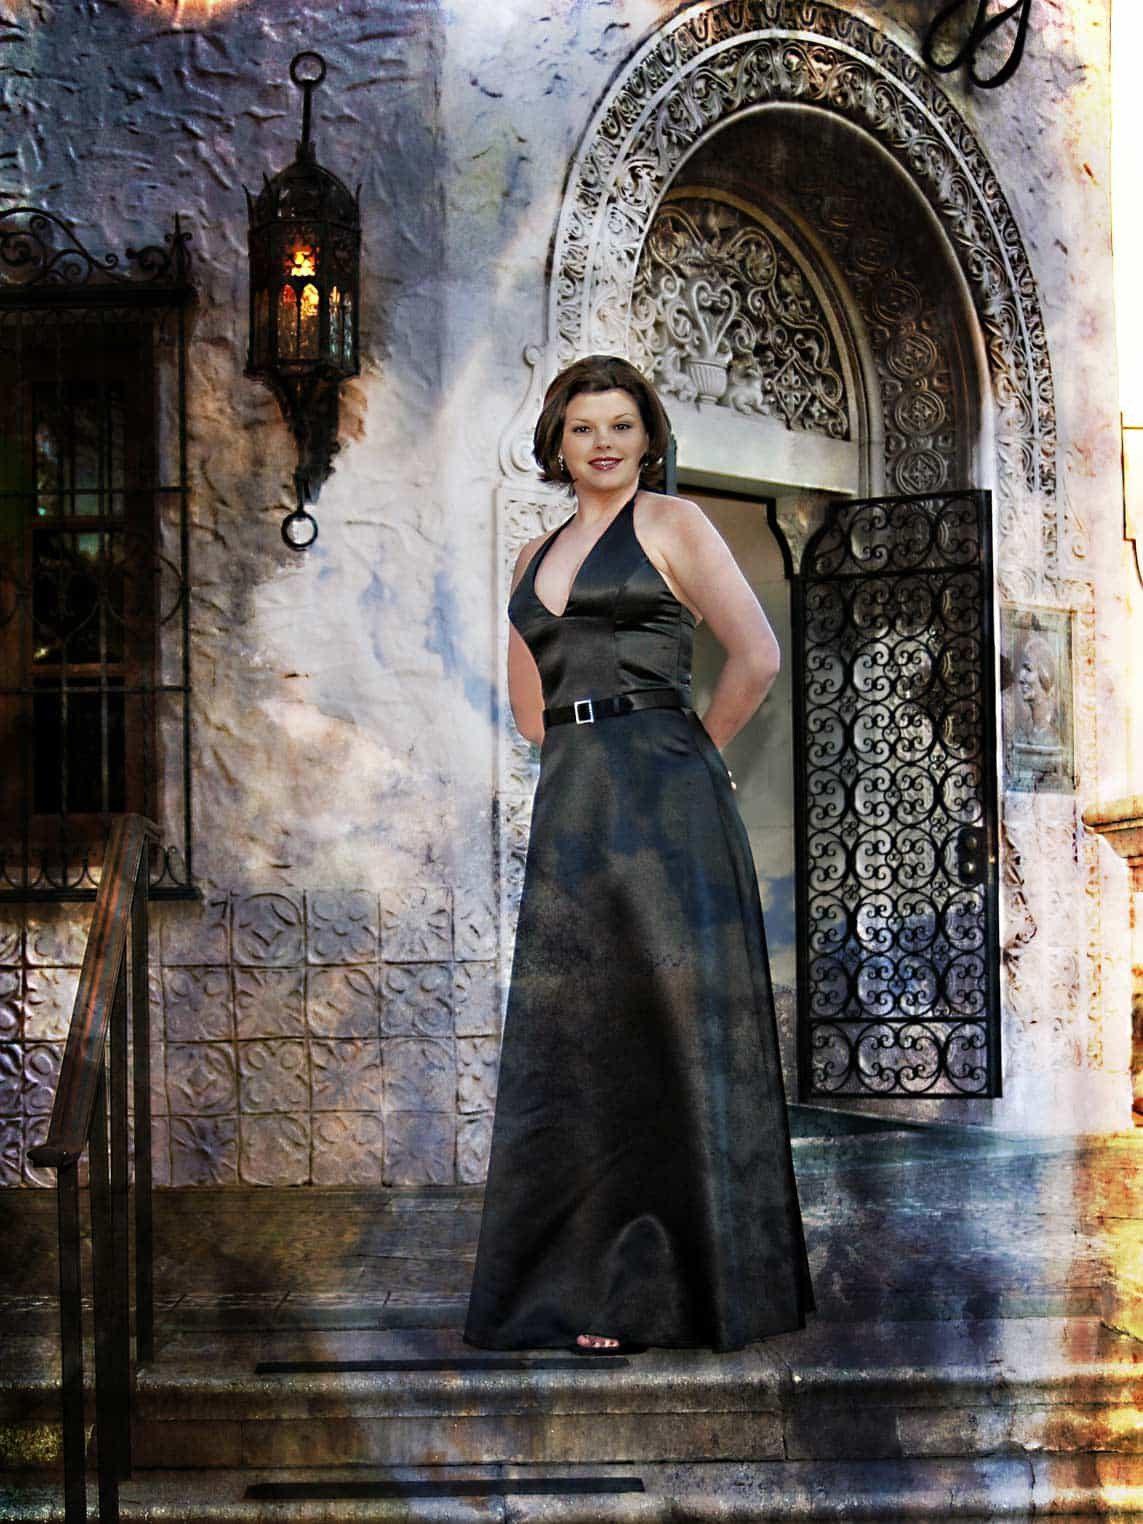 Stylish Senior Portrait Session Girl in Black Dress San Antonio Area Location